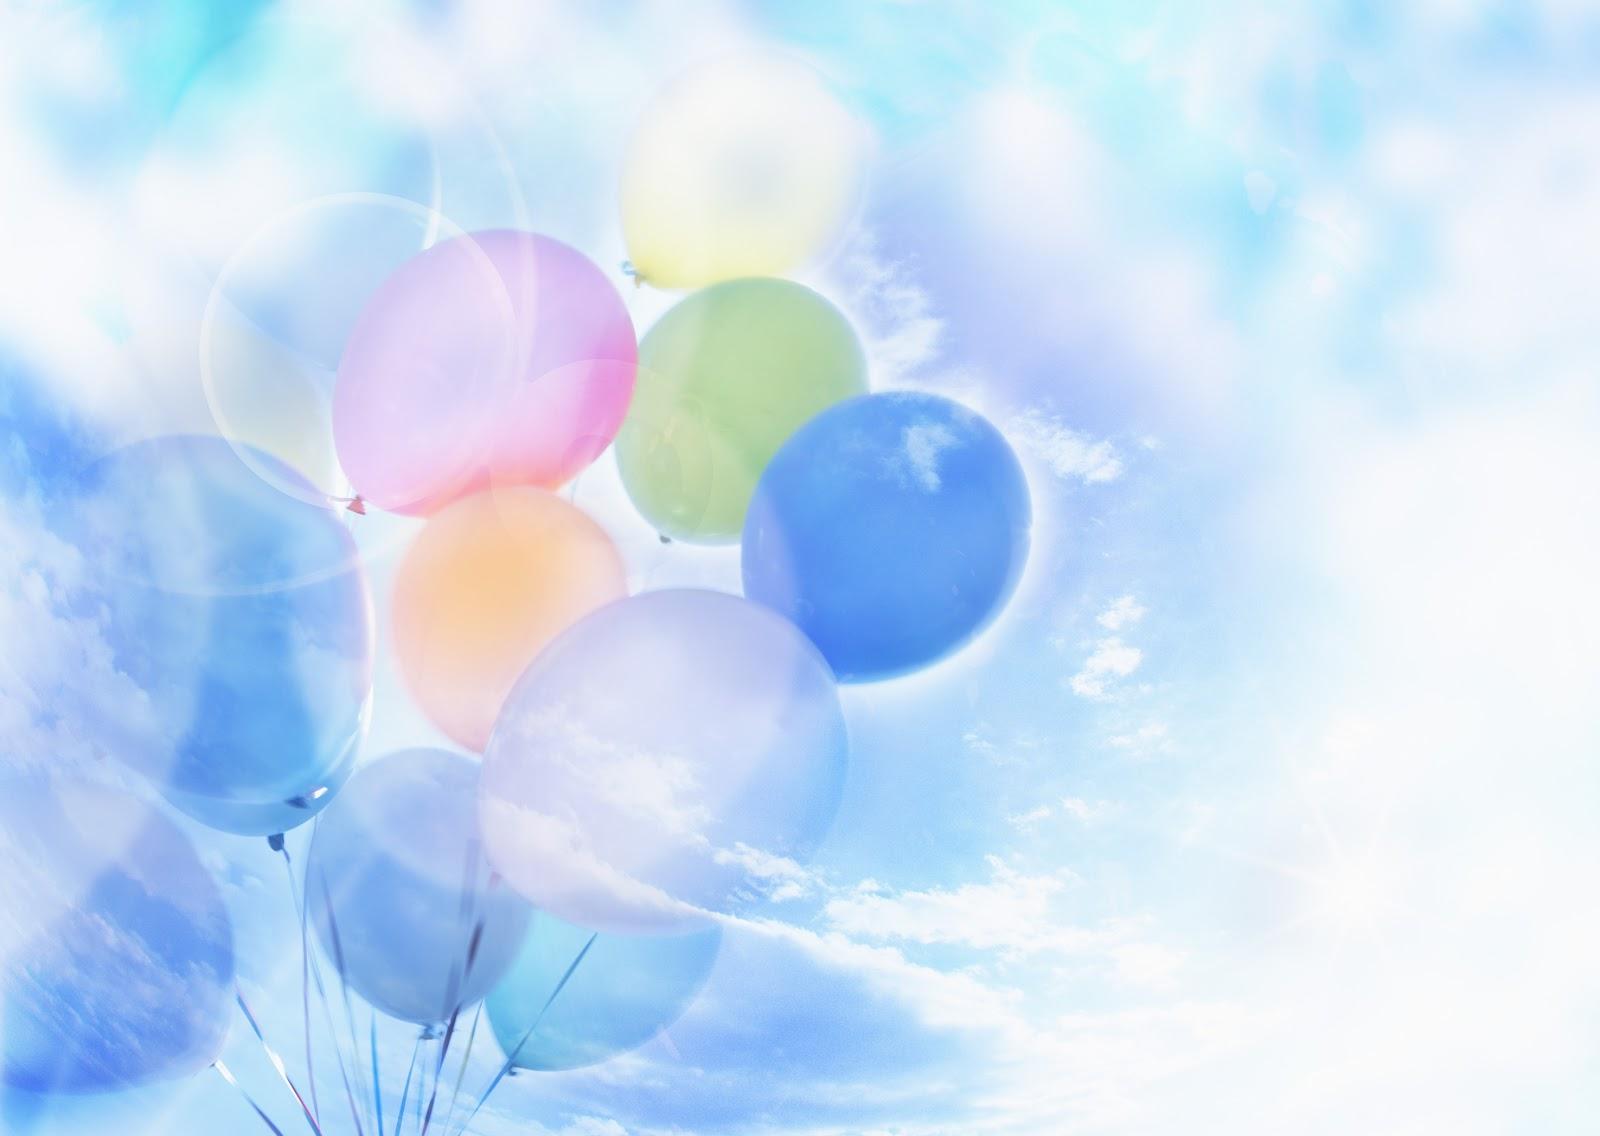 Wallpaper Sky Balloons 2